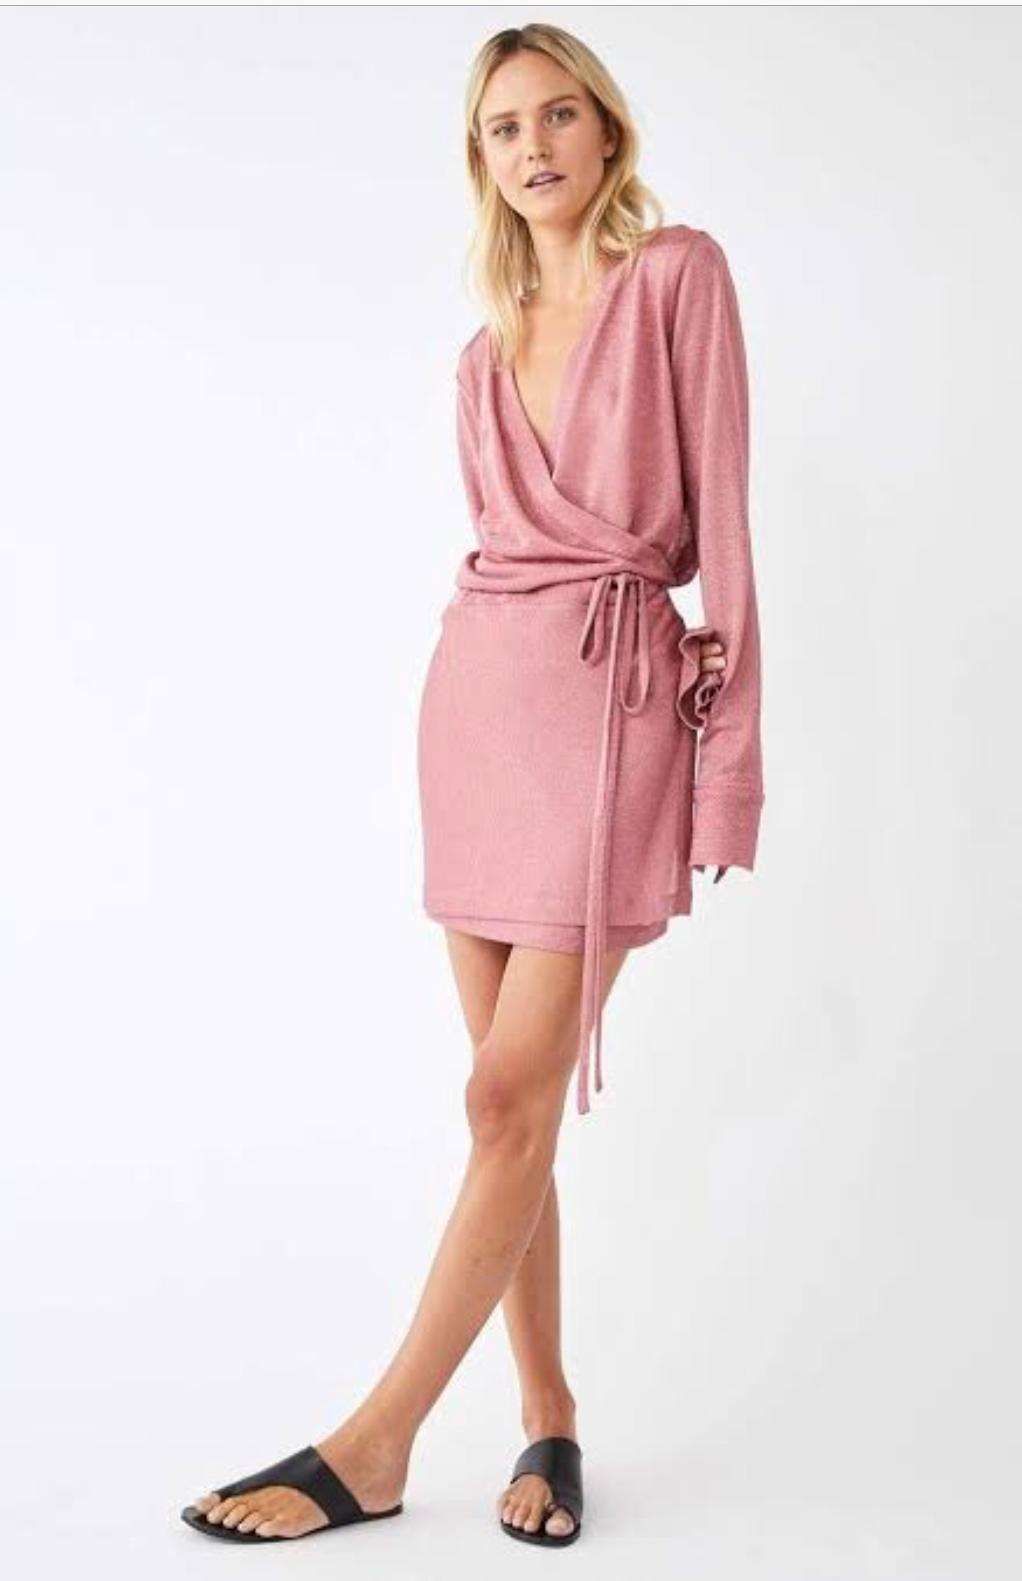 064a67339 Kacey Devlin Formation Mini Wrap Dress Metallic Pink size 8 / 10 | The Volte